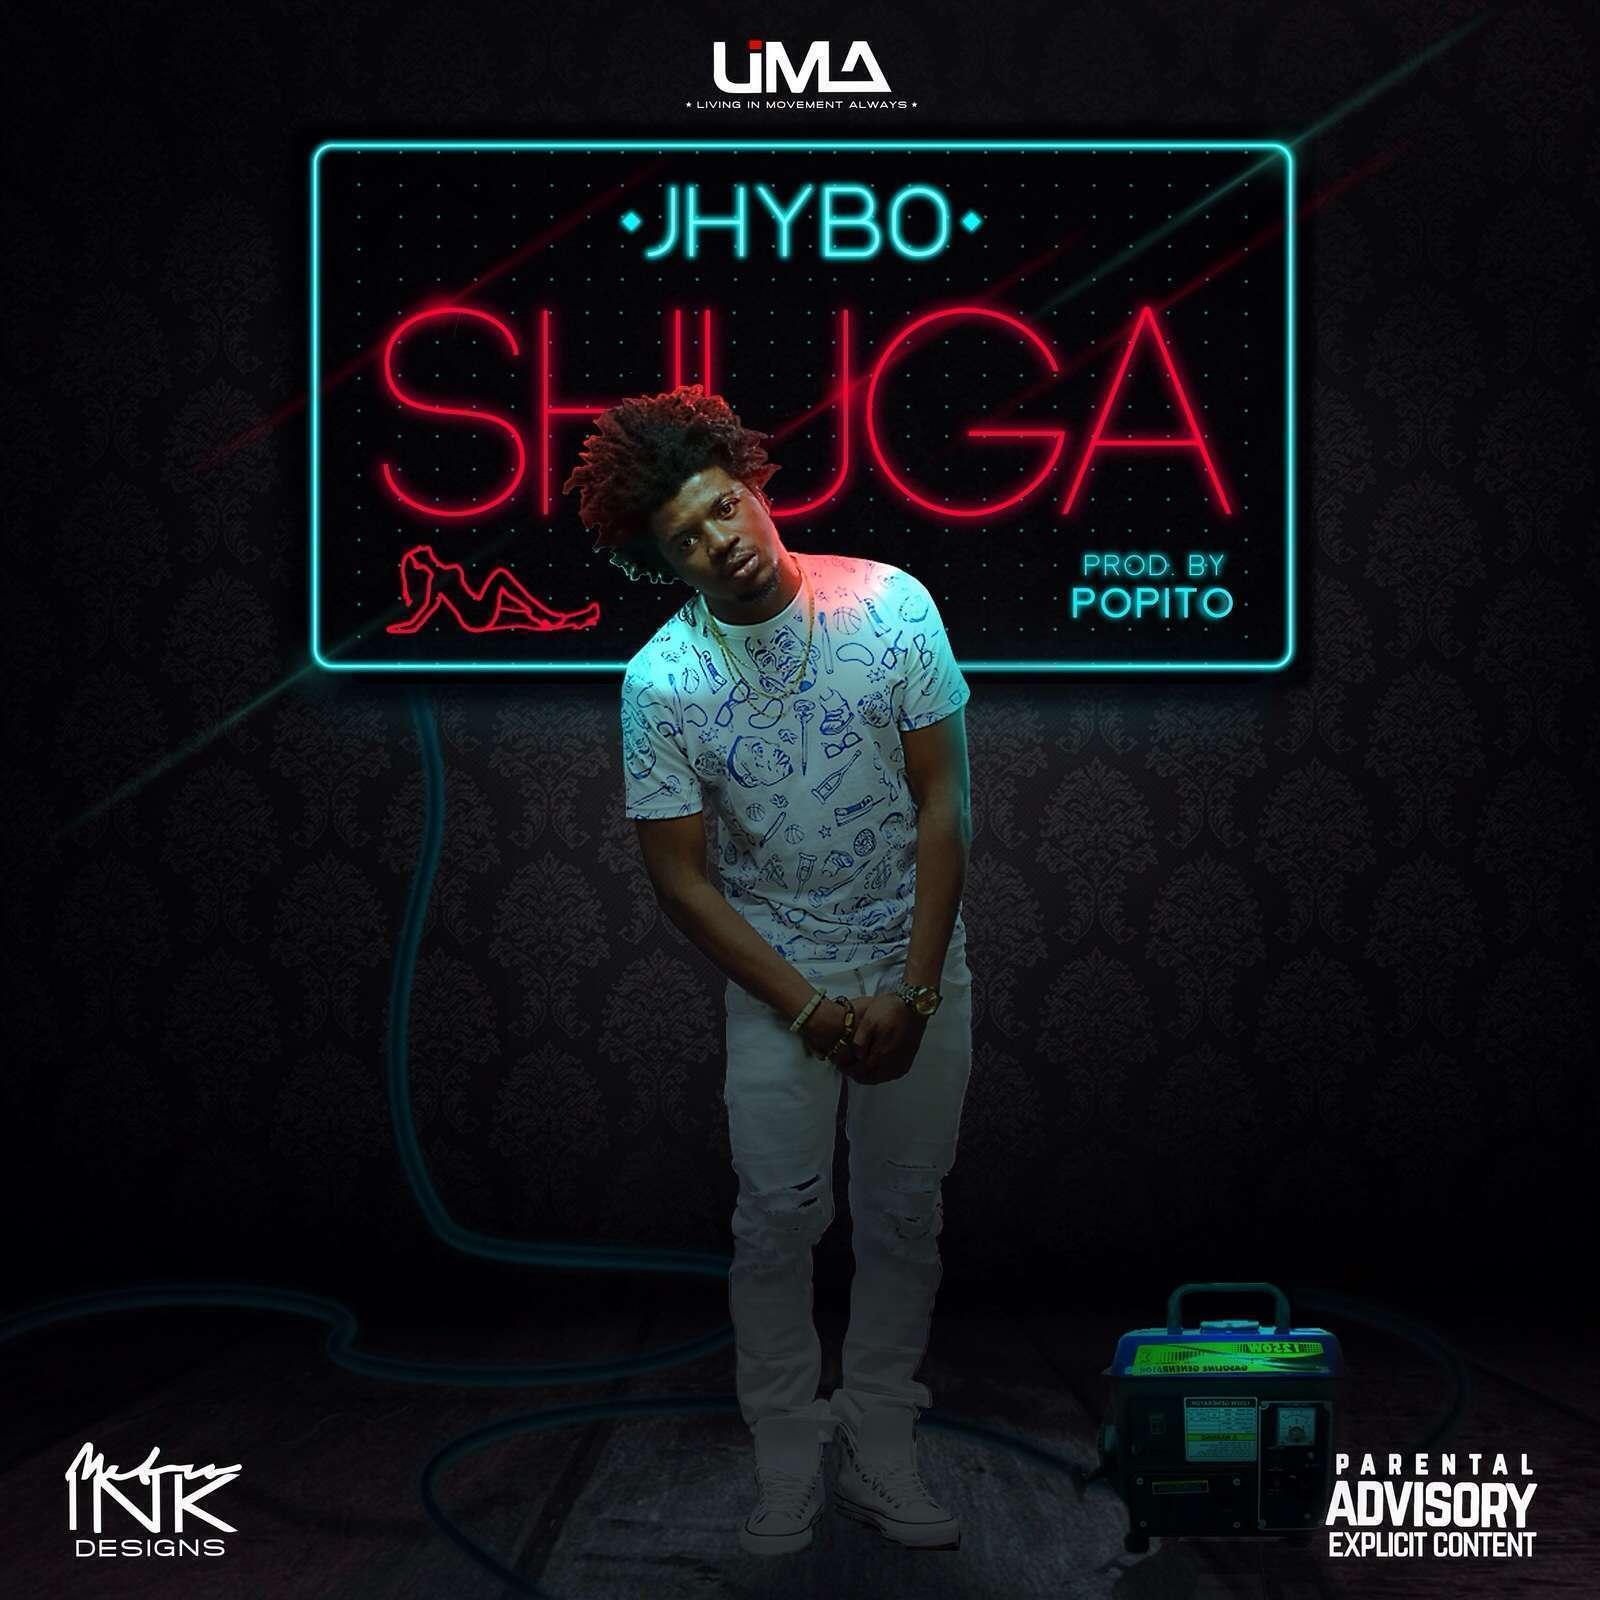 Jhybo - Shuga